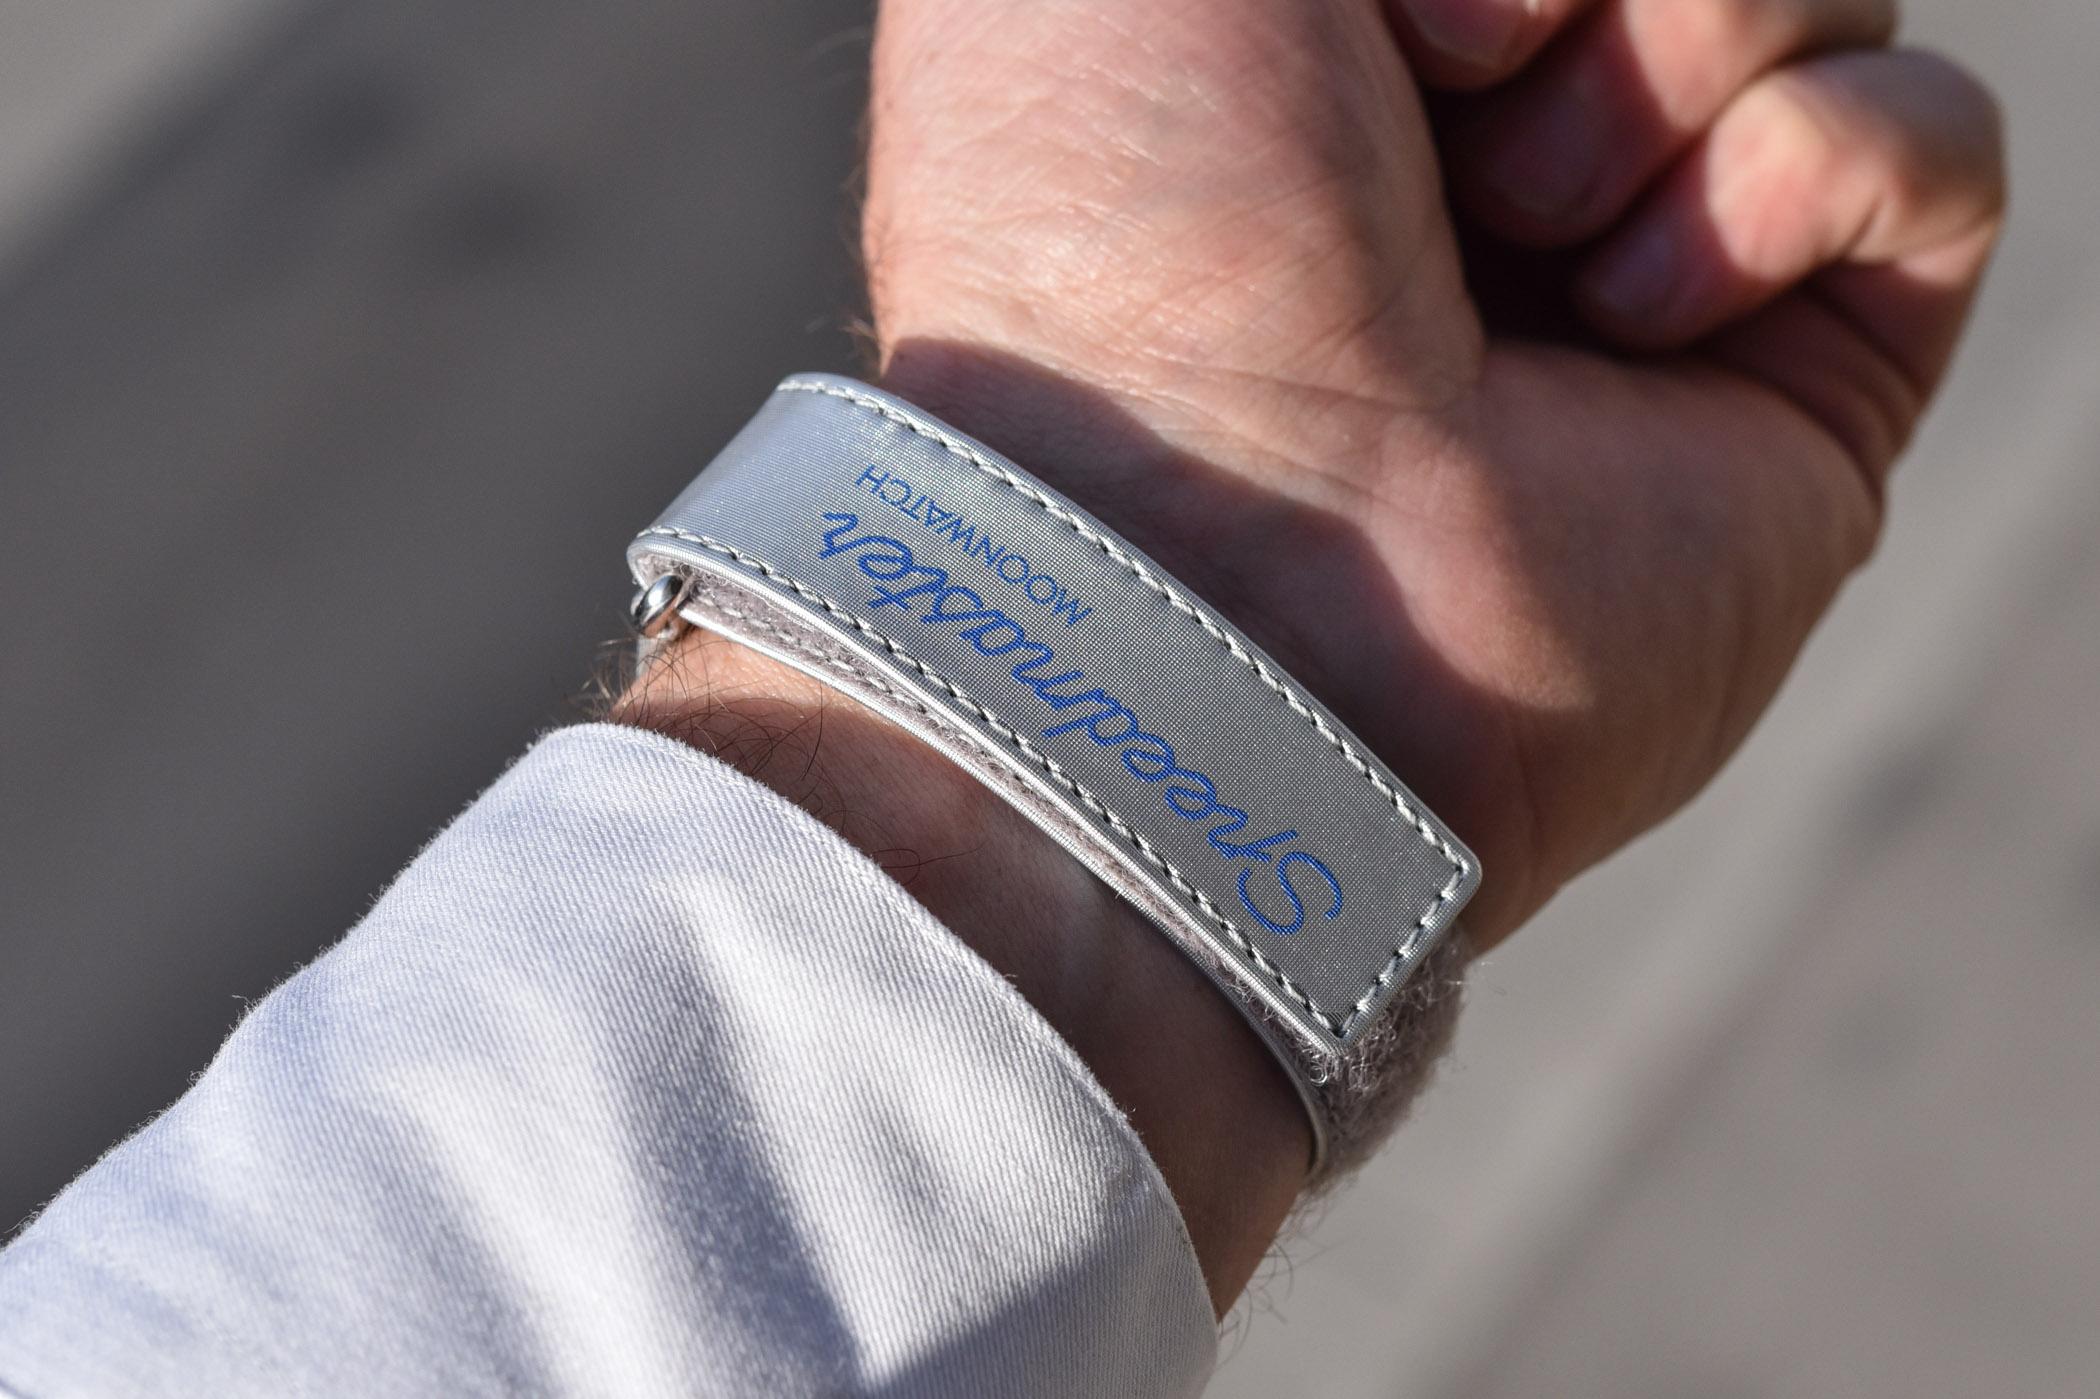 New NASA Velcro Straps for the Omega Speedmaster Moonwatch